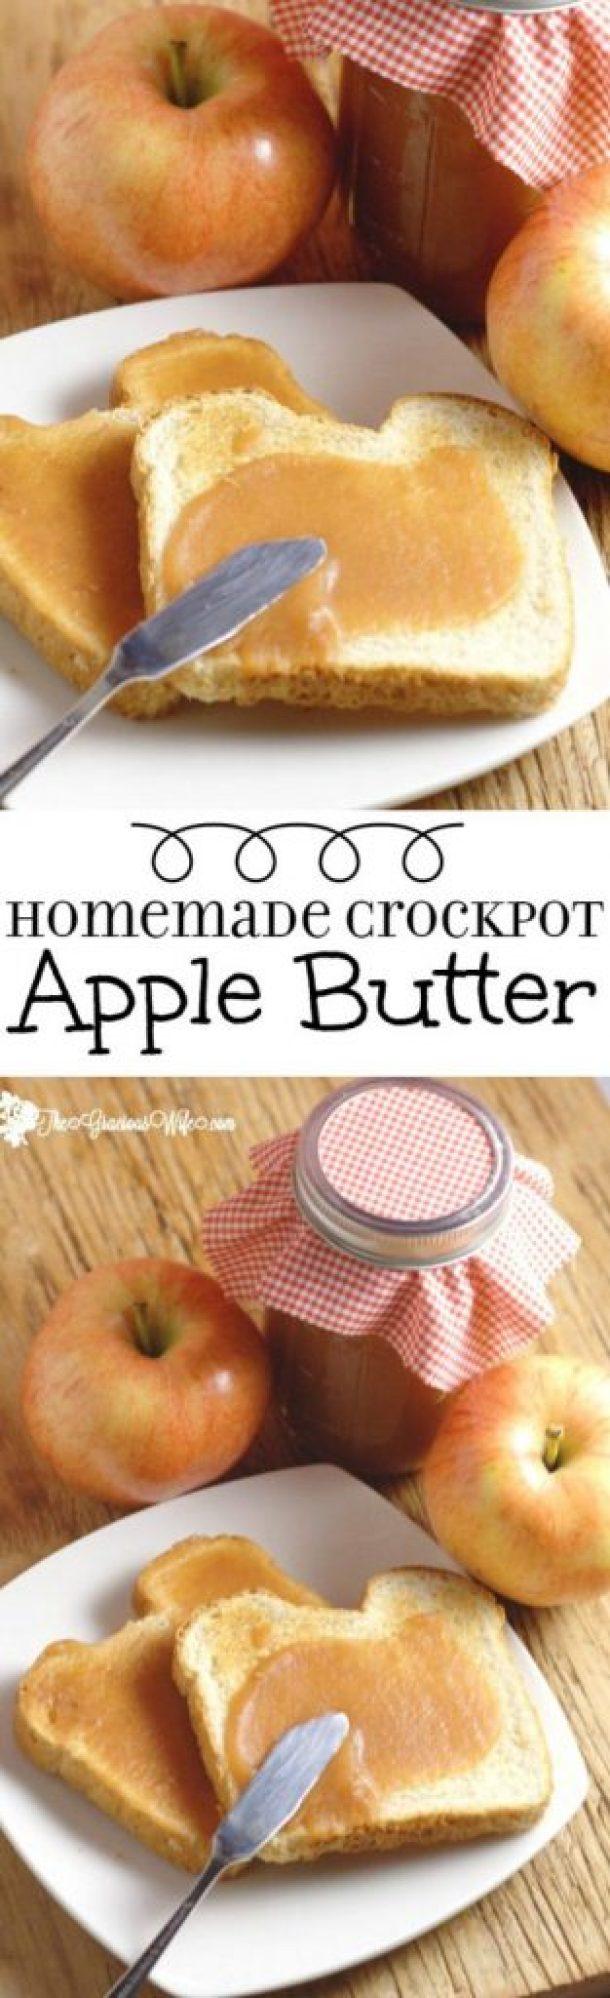 Homemade Crockpot Apple Butter Recipe | The Gracious Wife - Apple Recipes